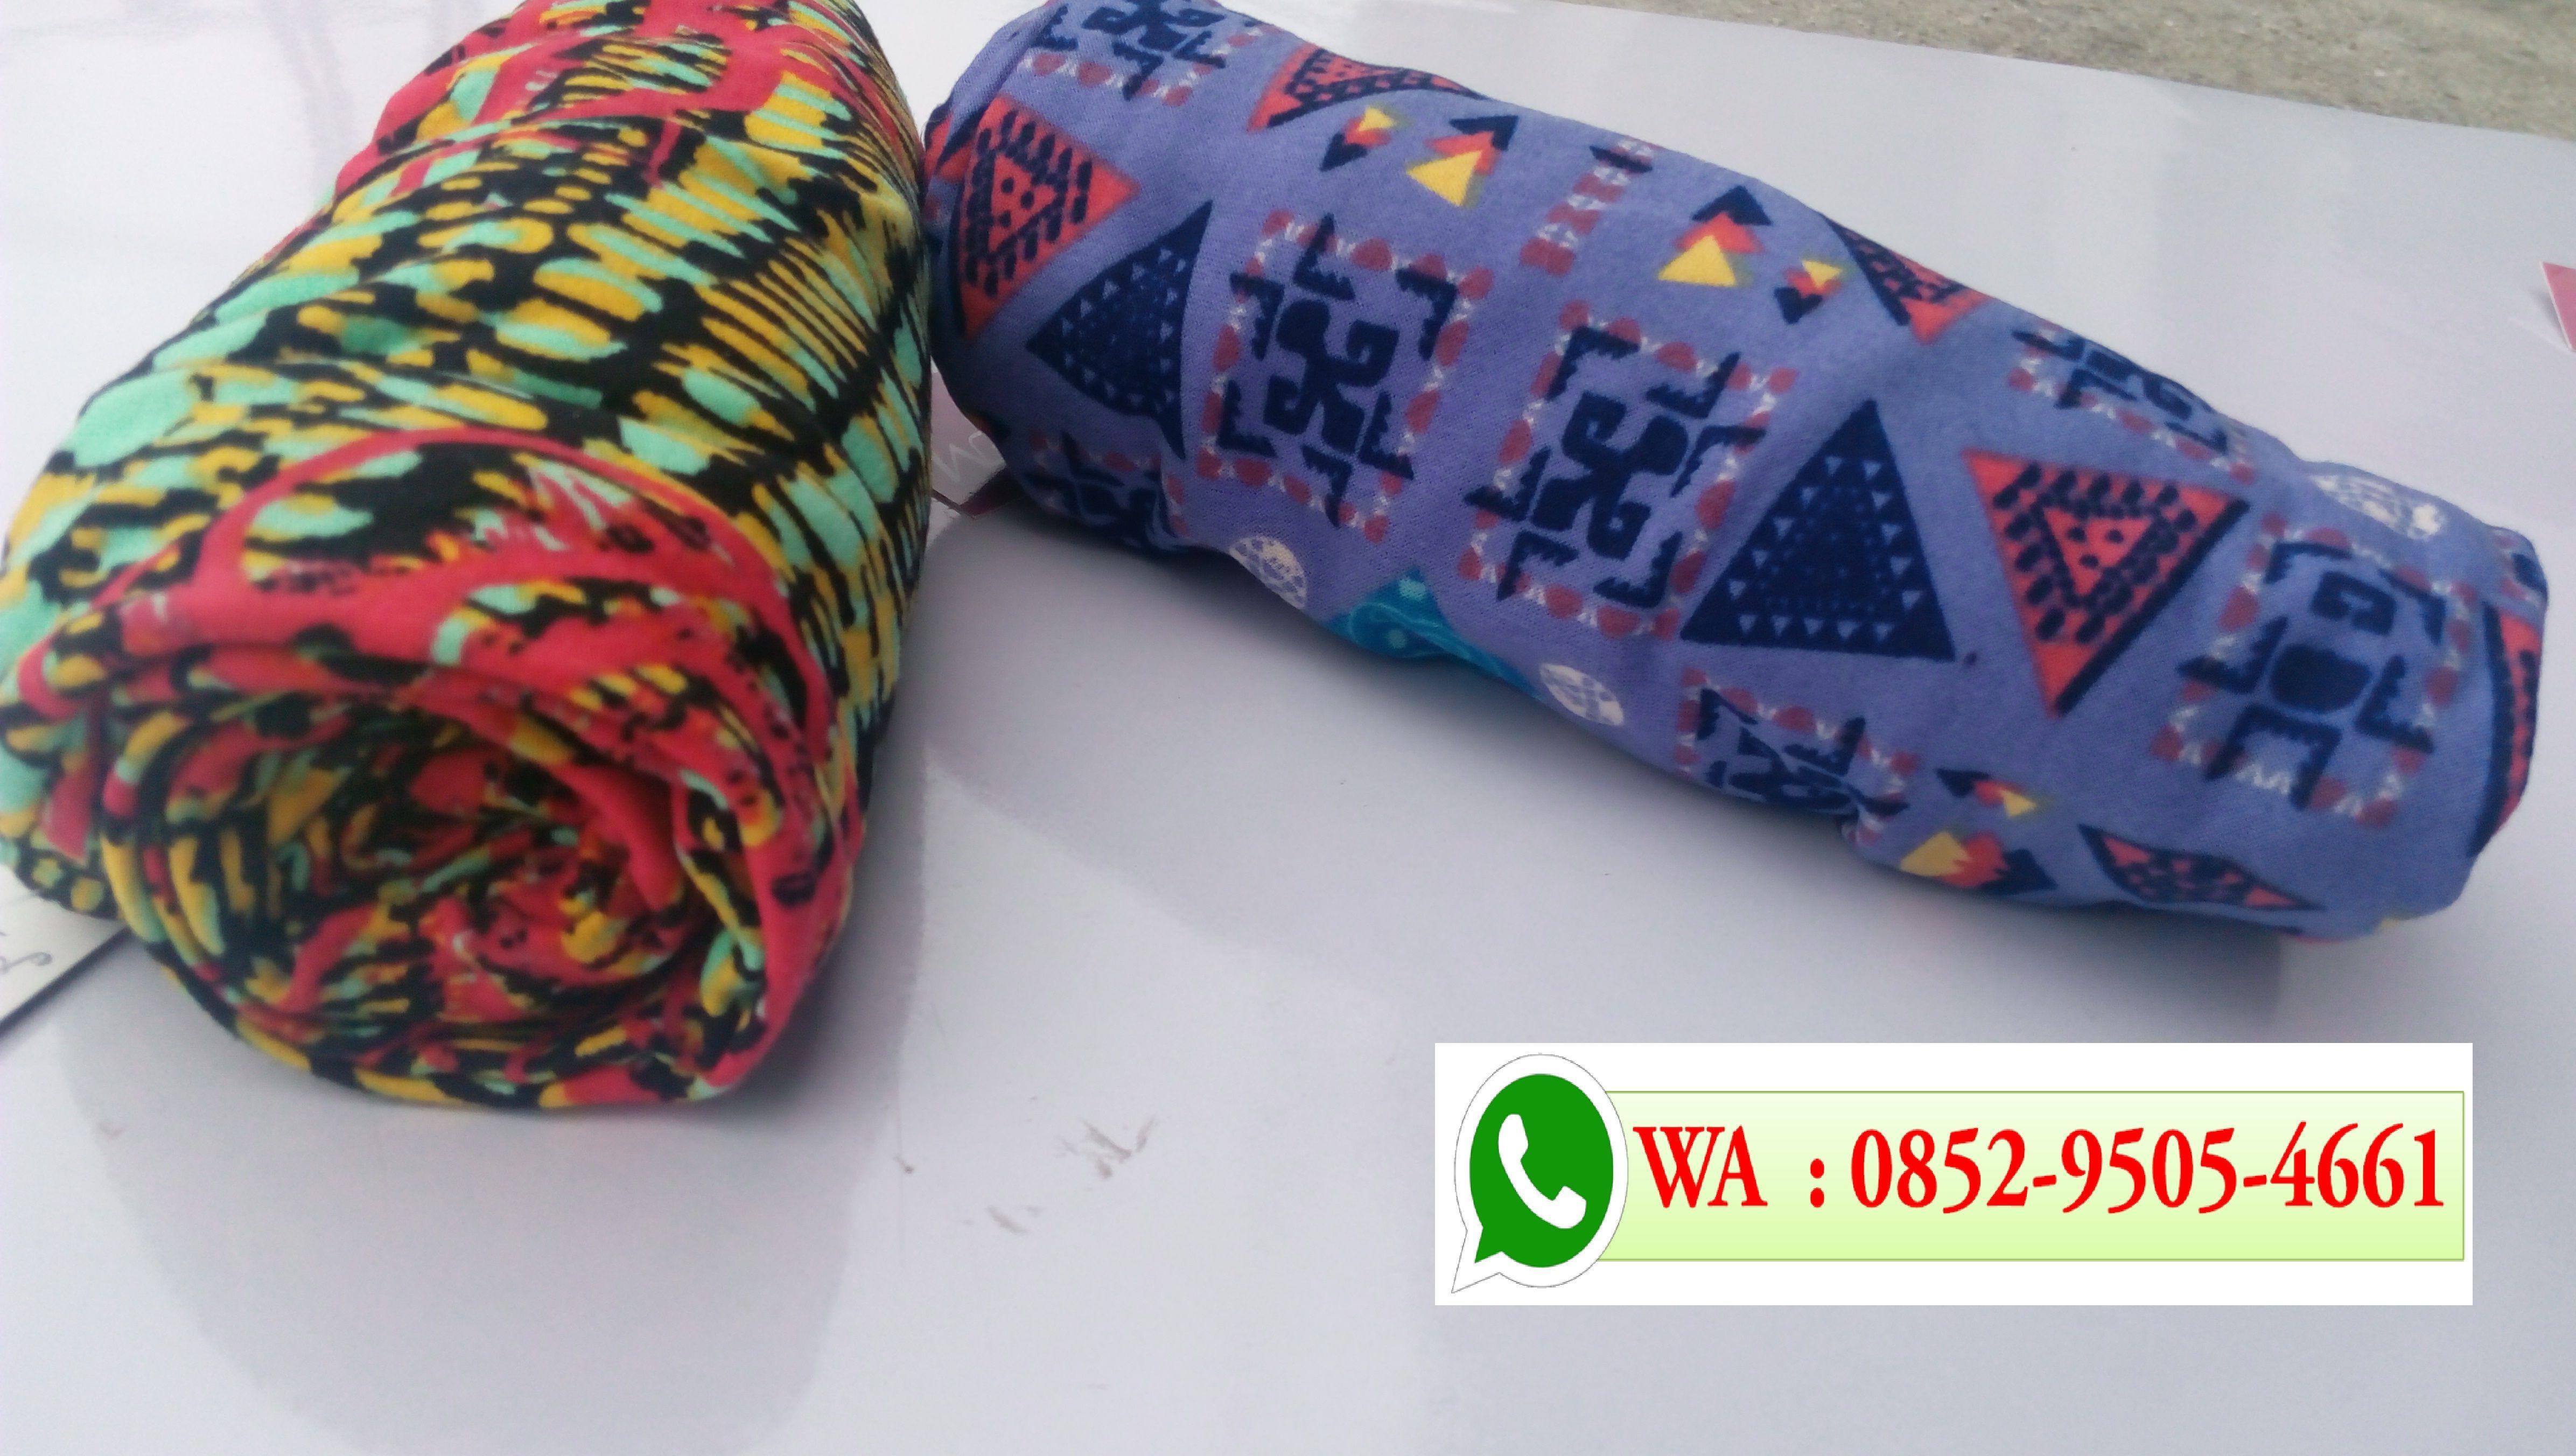 Harga Legging Anak Motif Celana Legging Calvina Legging Anak Termurah Grosir Legging Anak Yogyakarta Jual Online Legging Anak Legging Anak Anak Perempuan